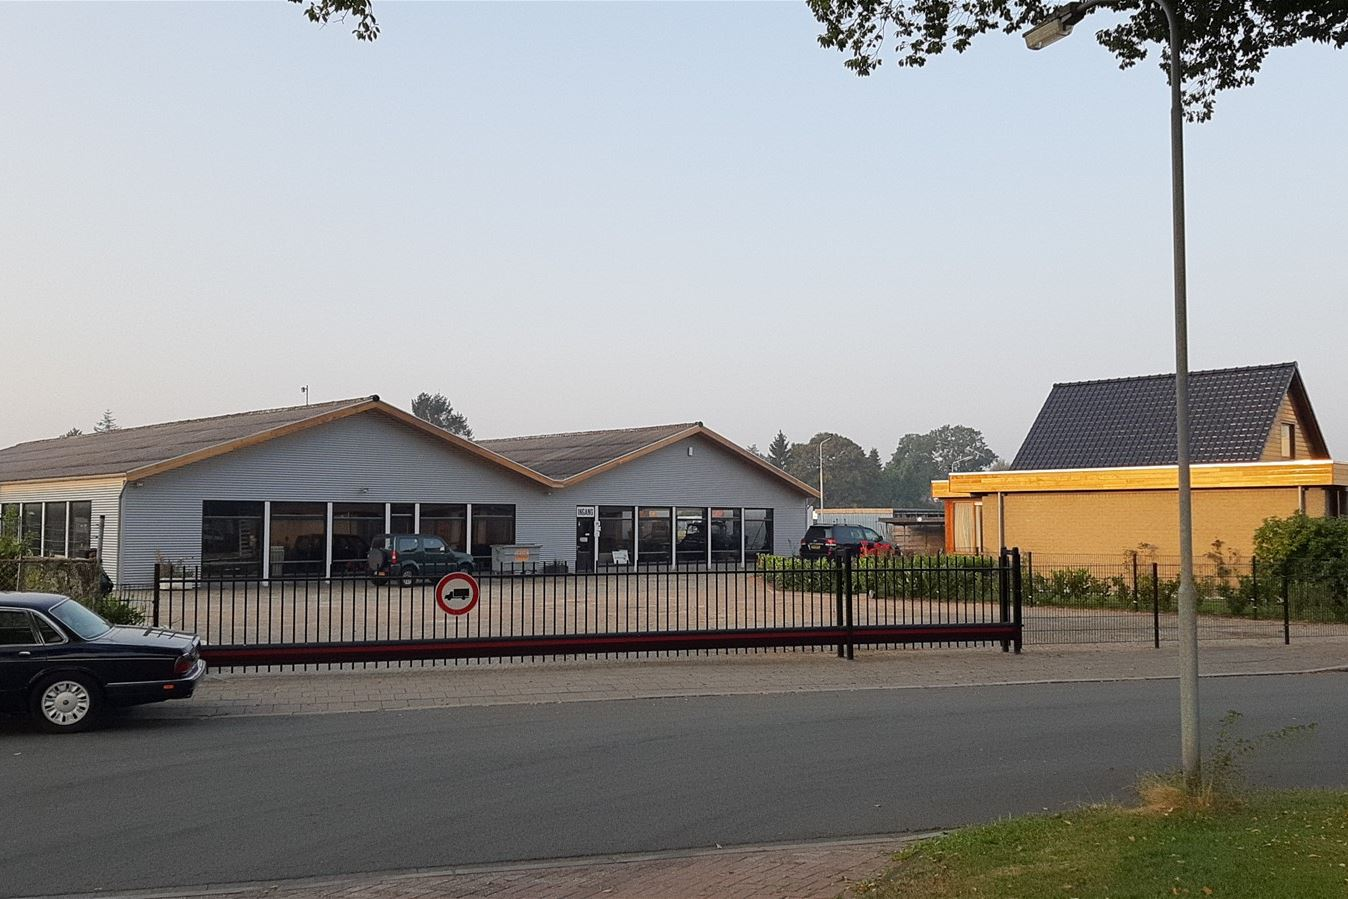 View photo 1 of Nijverheidsweg 14 -14a